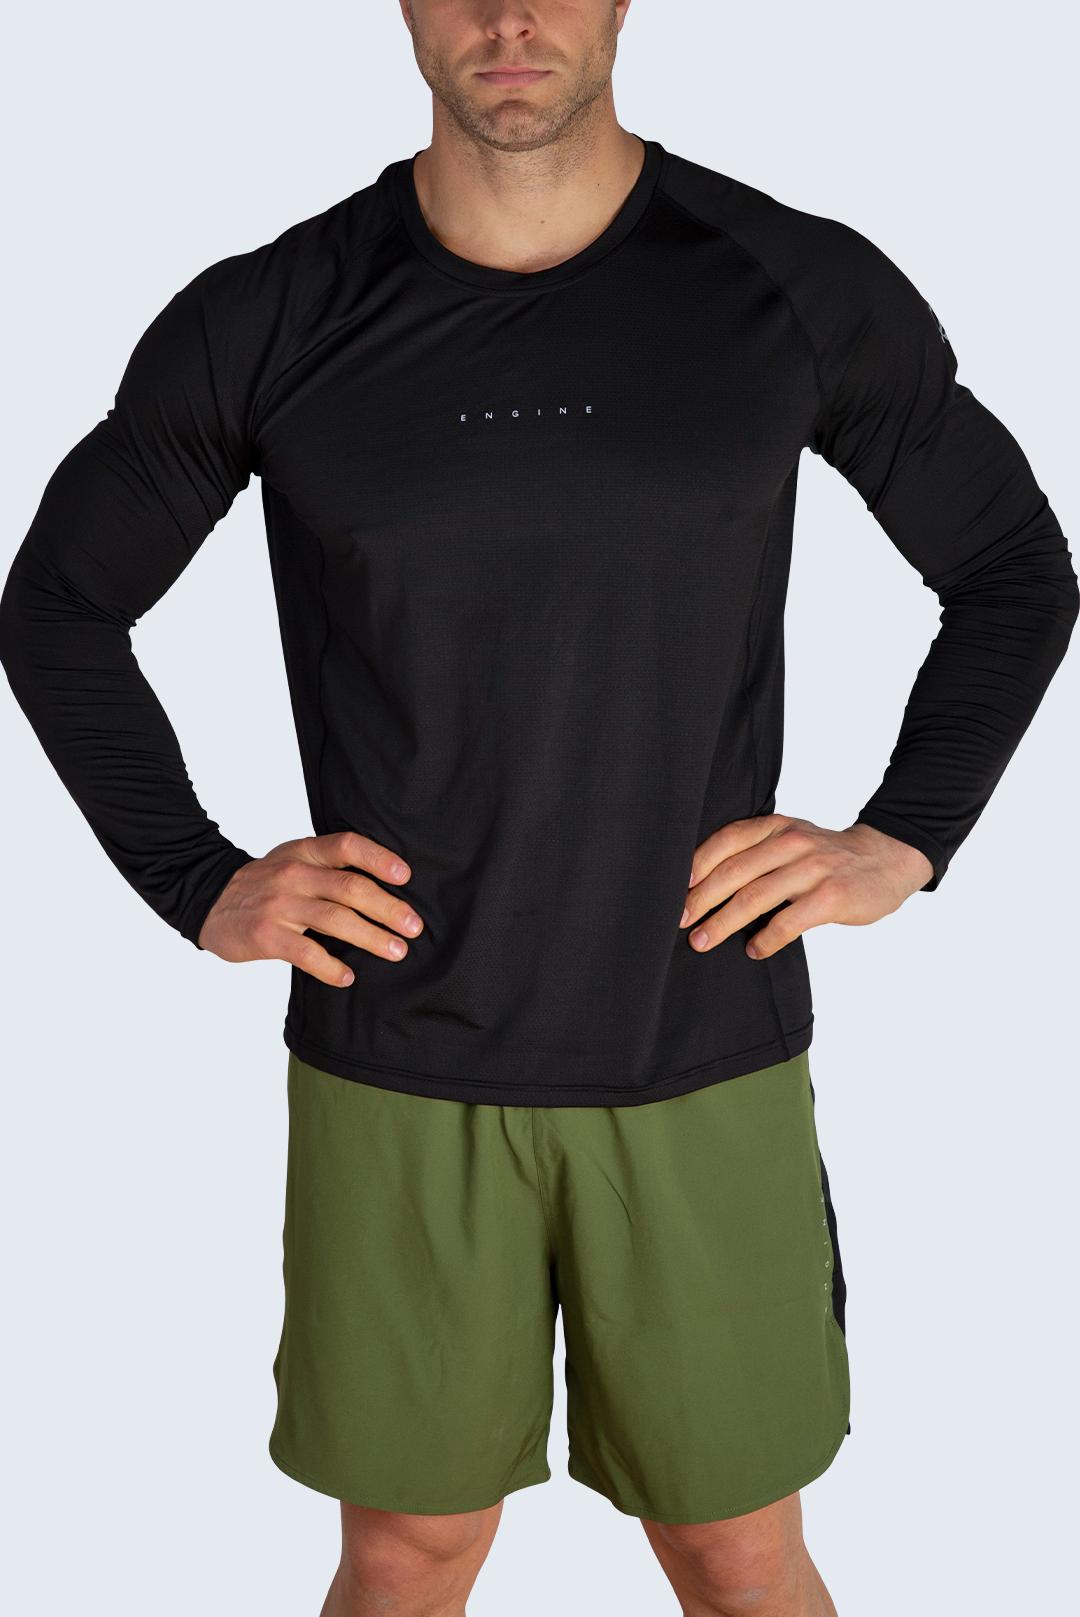 Men's Classic Long Sleeve Top